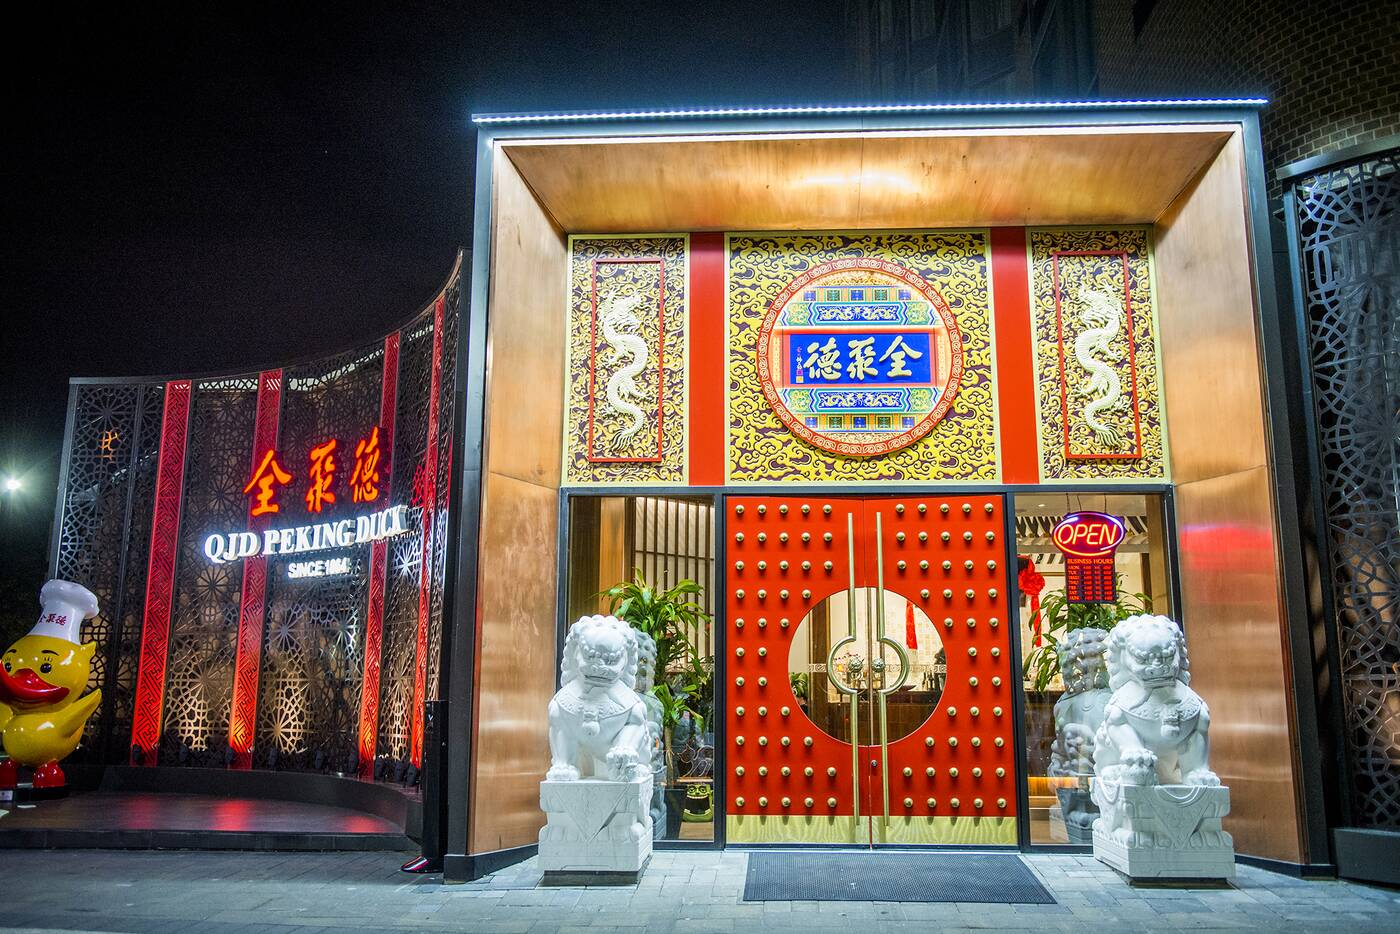 Qjd Peking Duck Restaurant Toronto